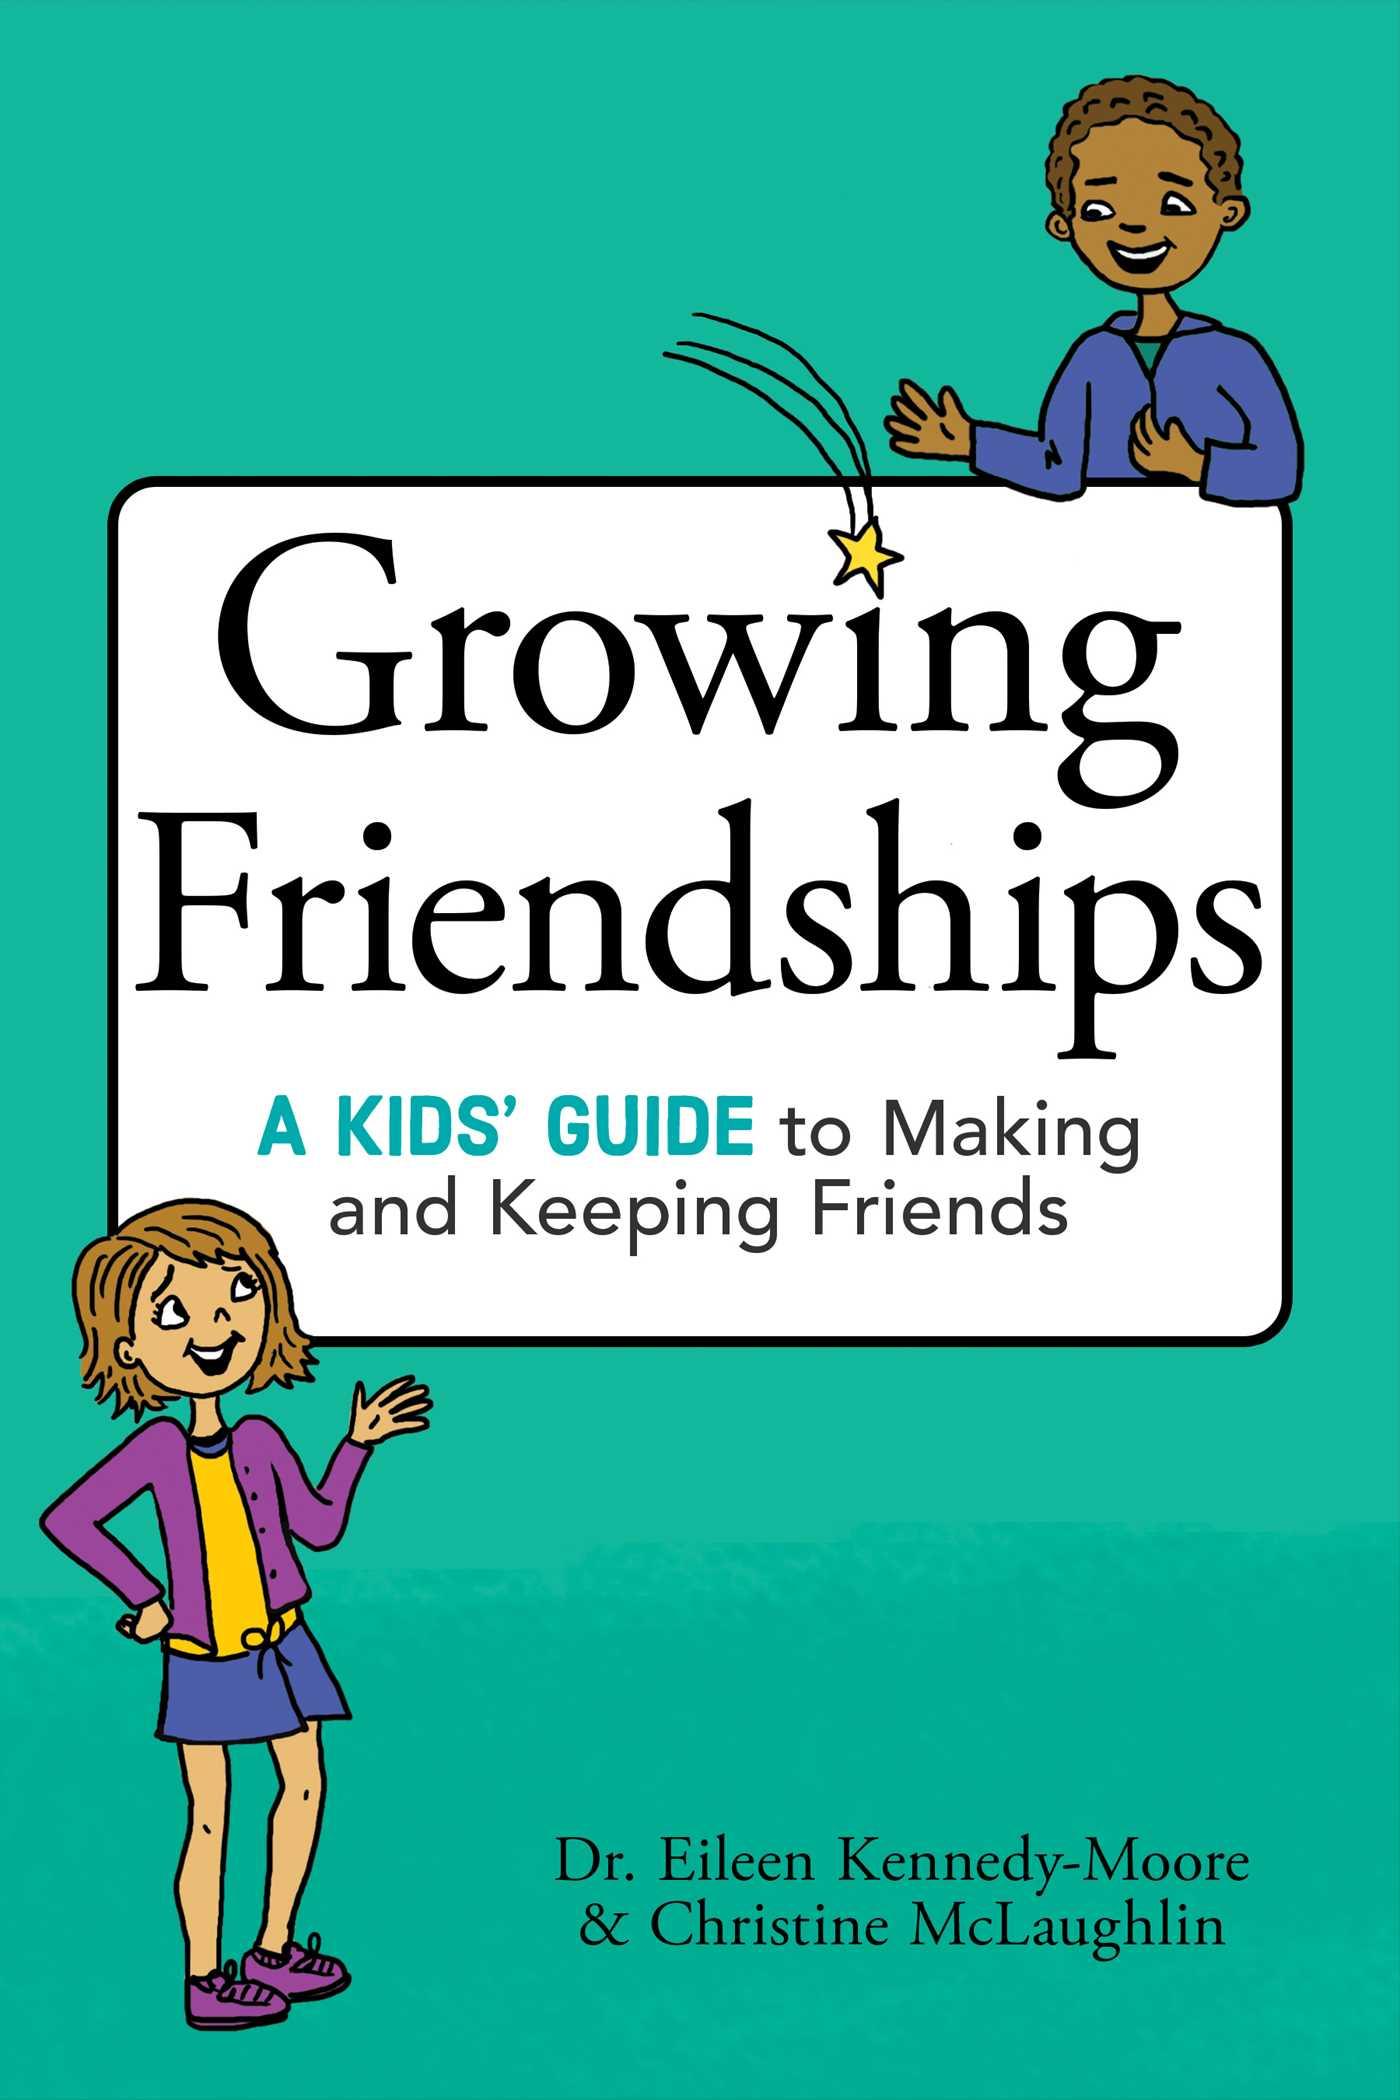 Growing friendships 9781582705880 hr